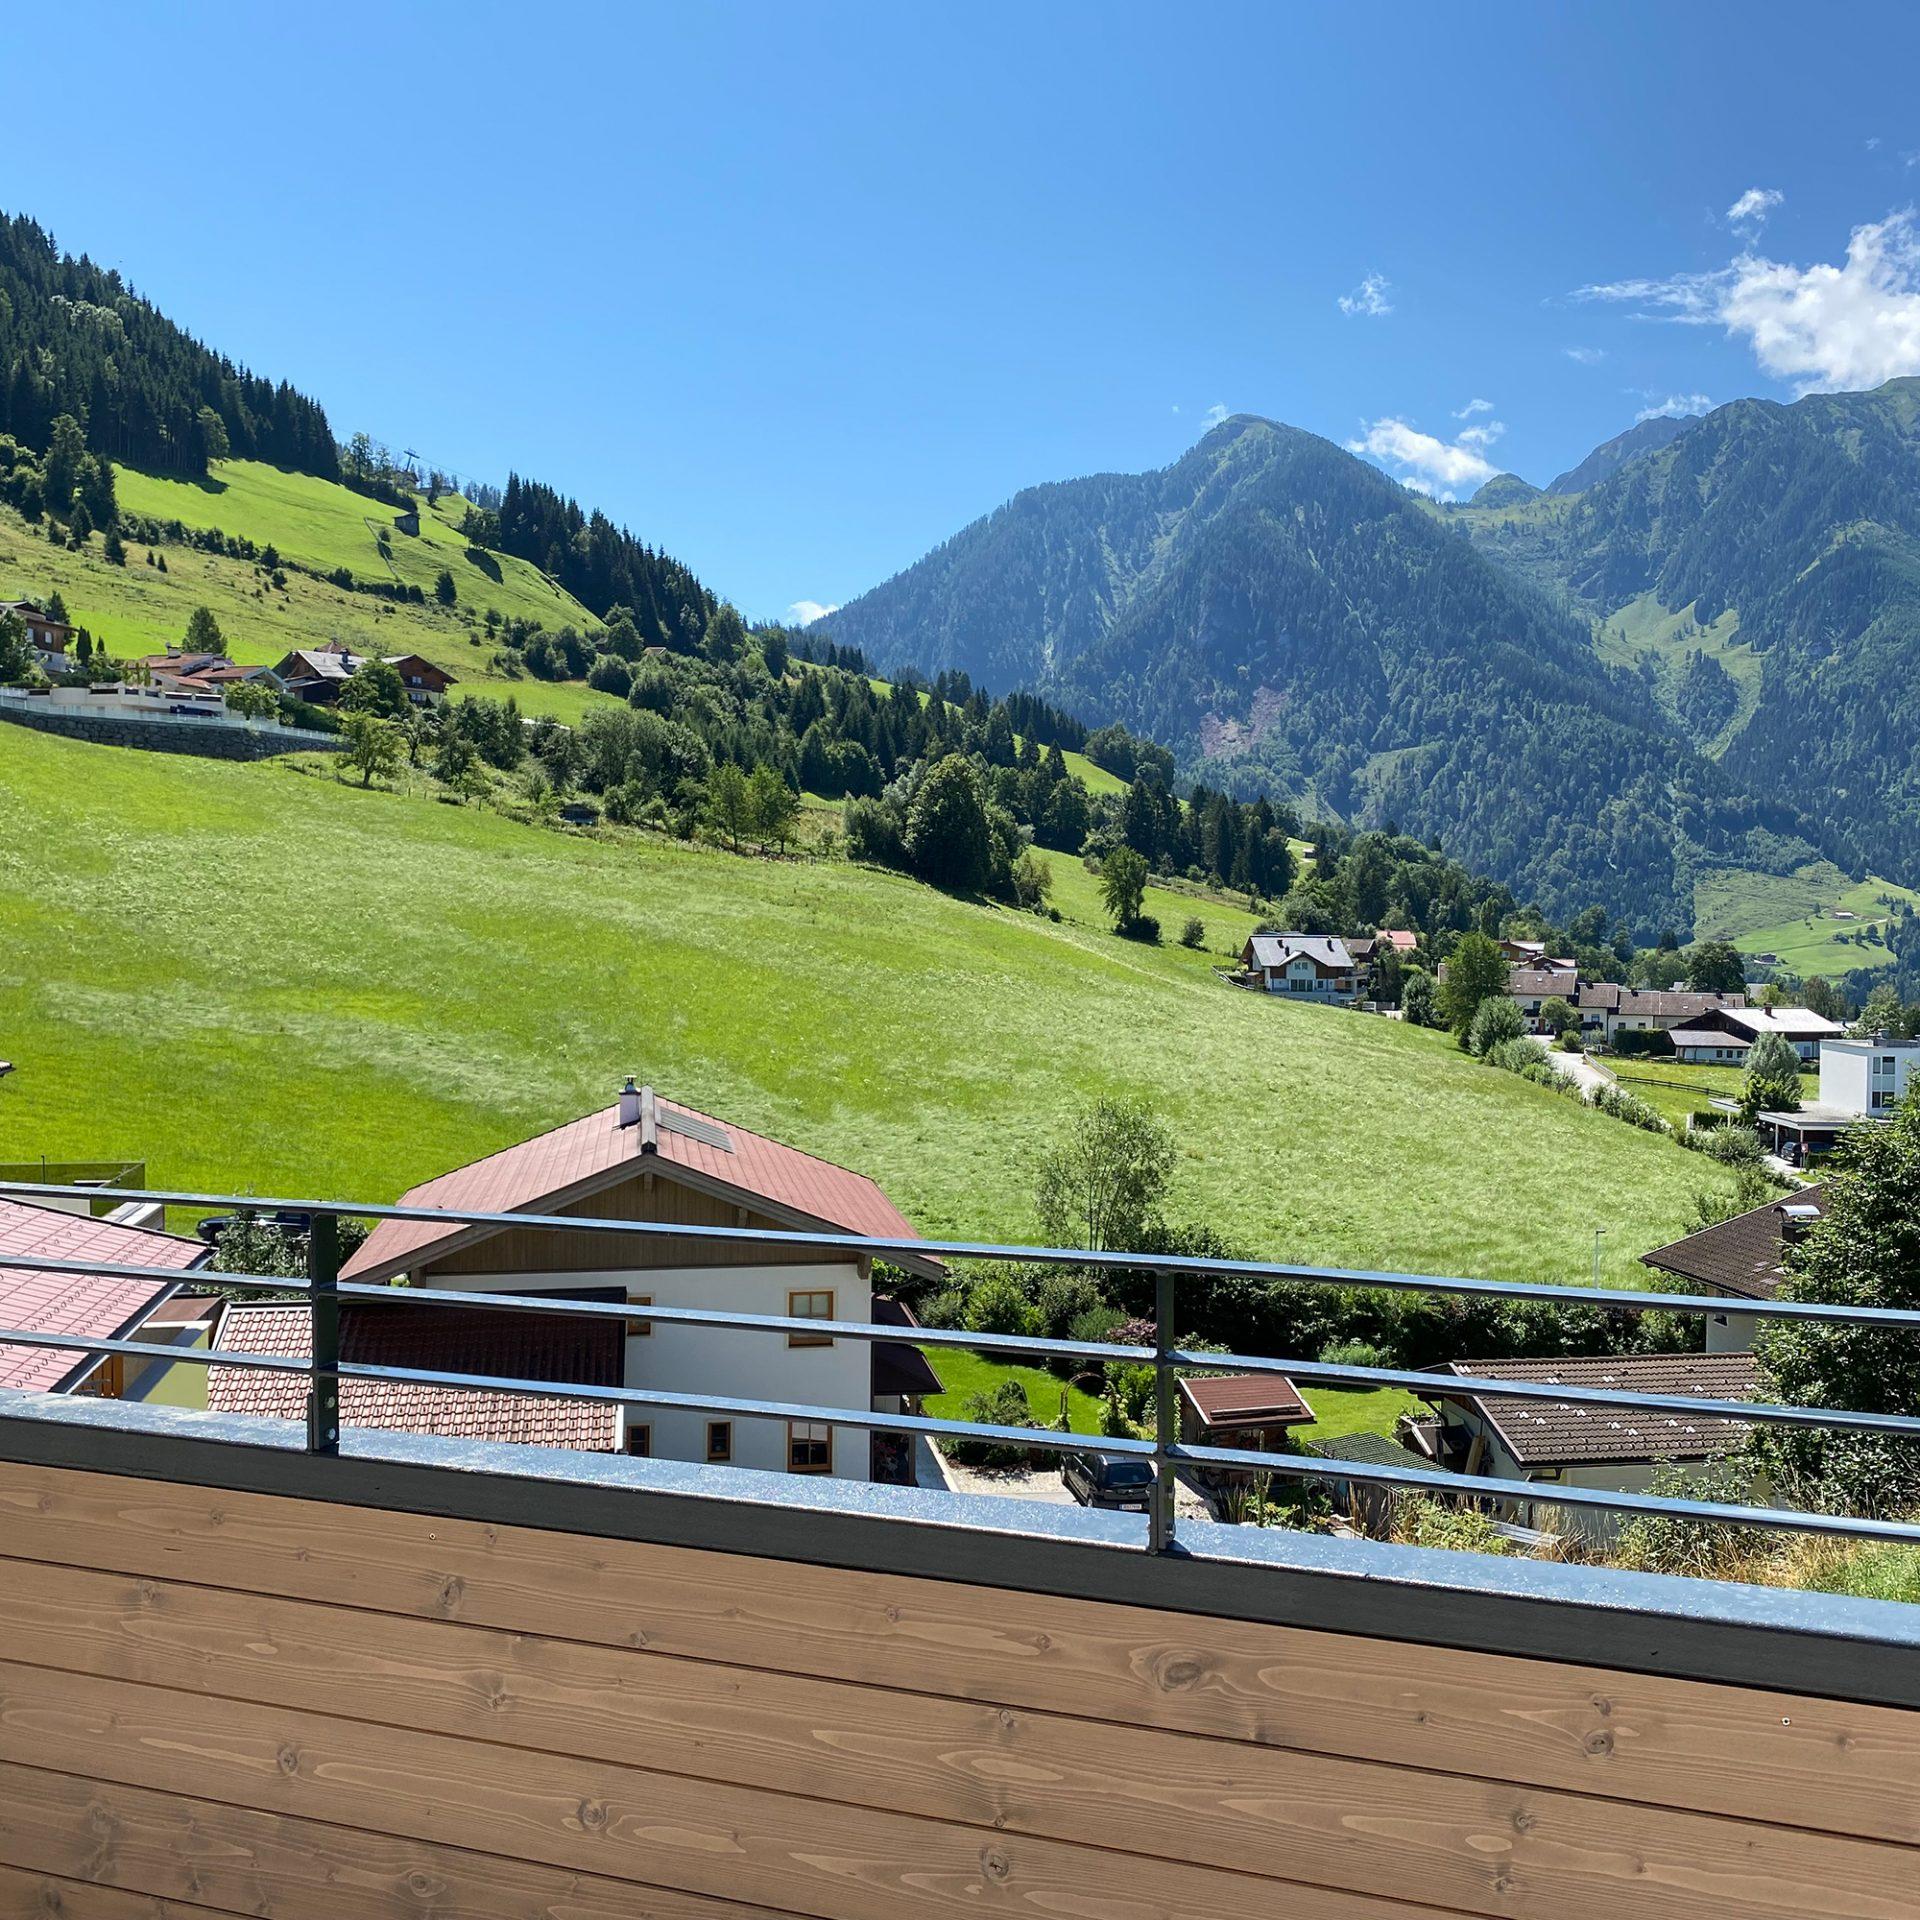 Blaupause_Alpendorf_Top5_Terrasse_2